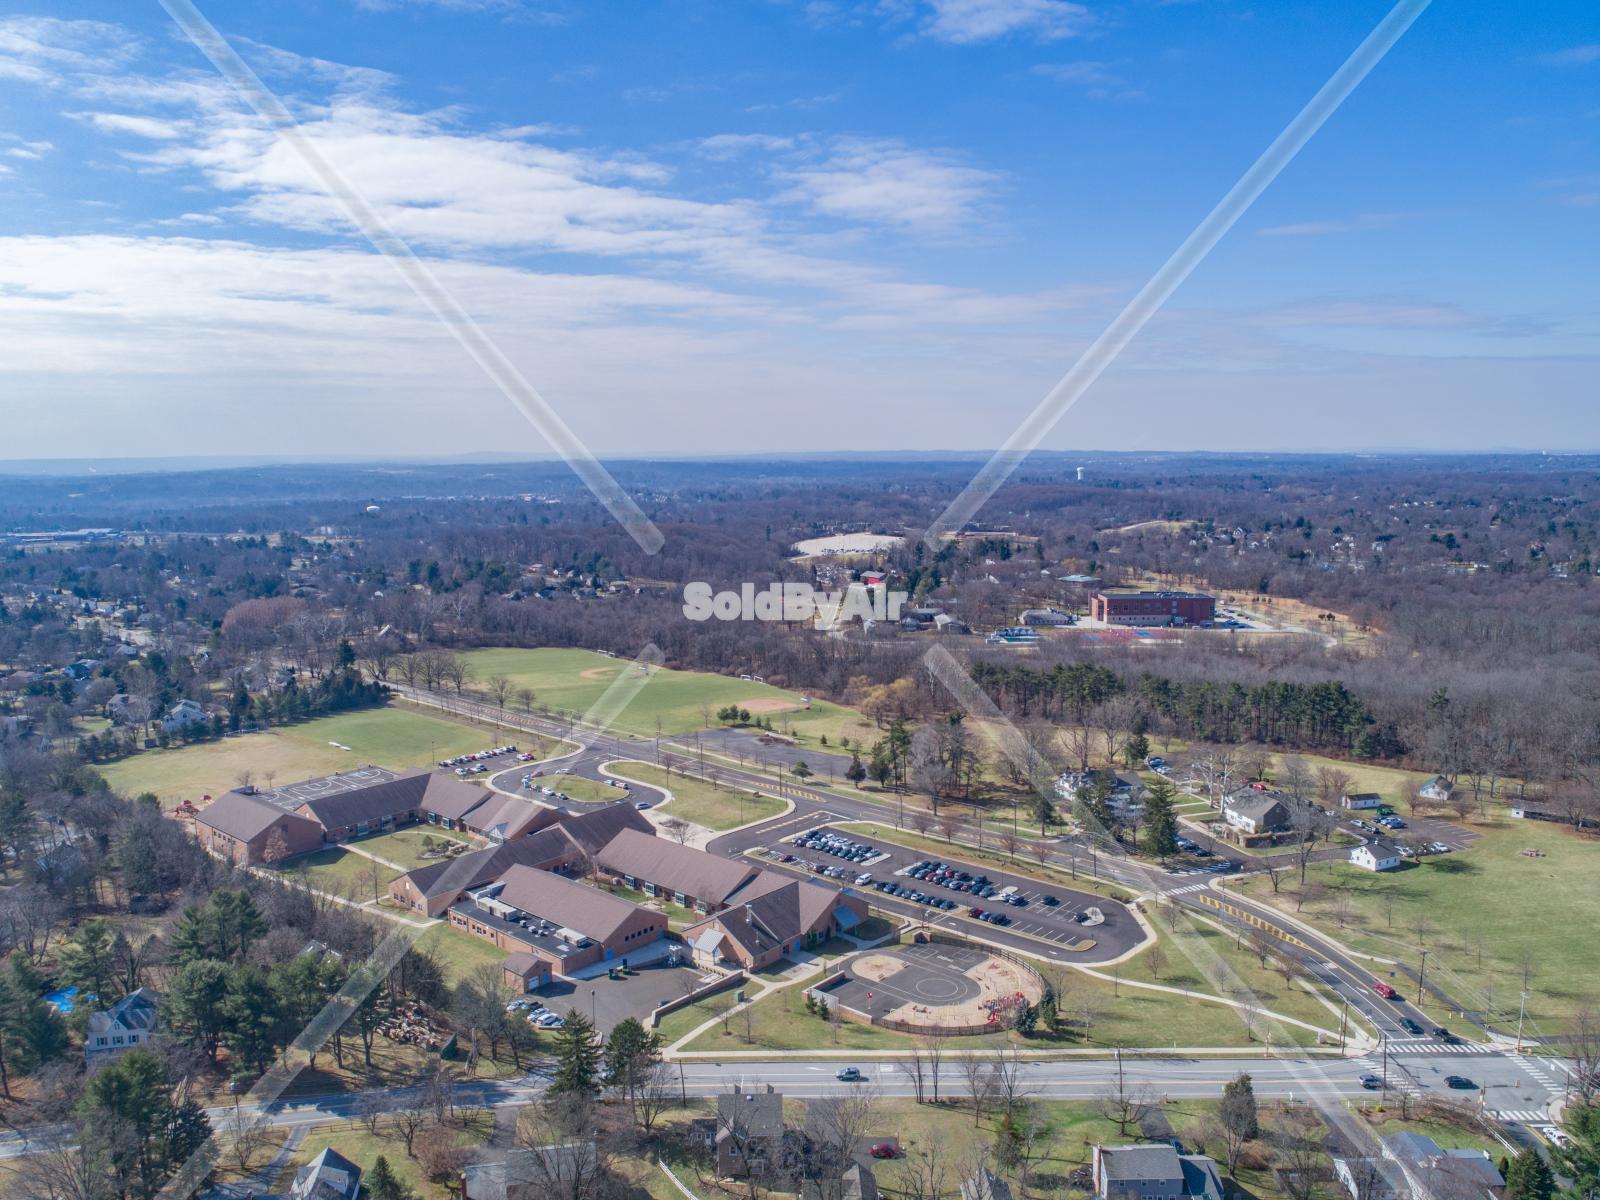 Drone Photo of Maple Glen Elementary School in Maple Glen Pennsylvania